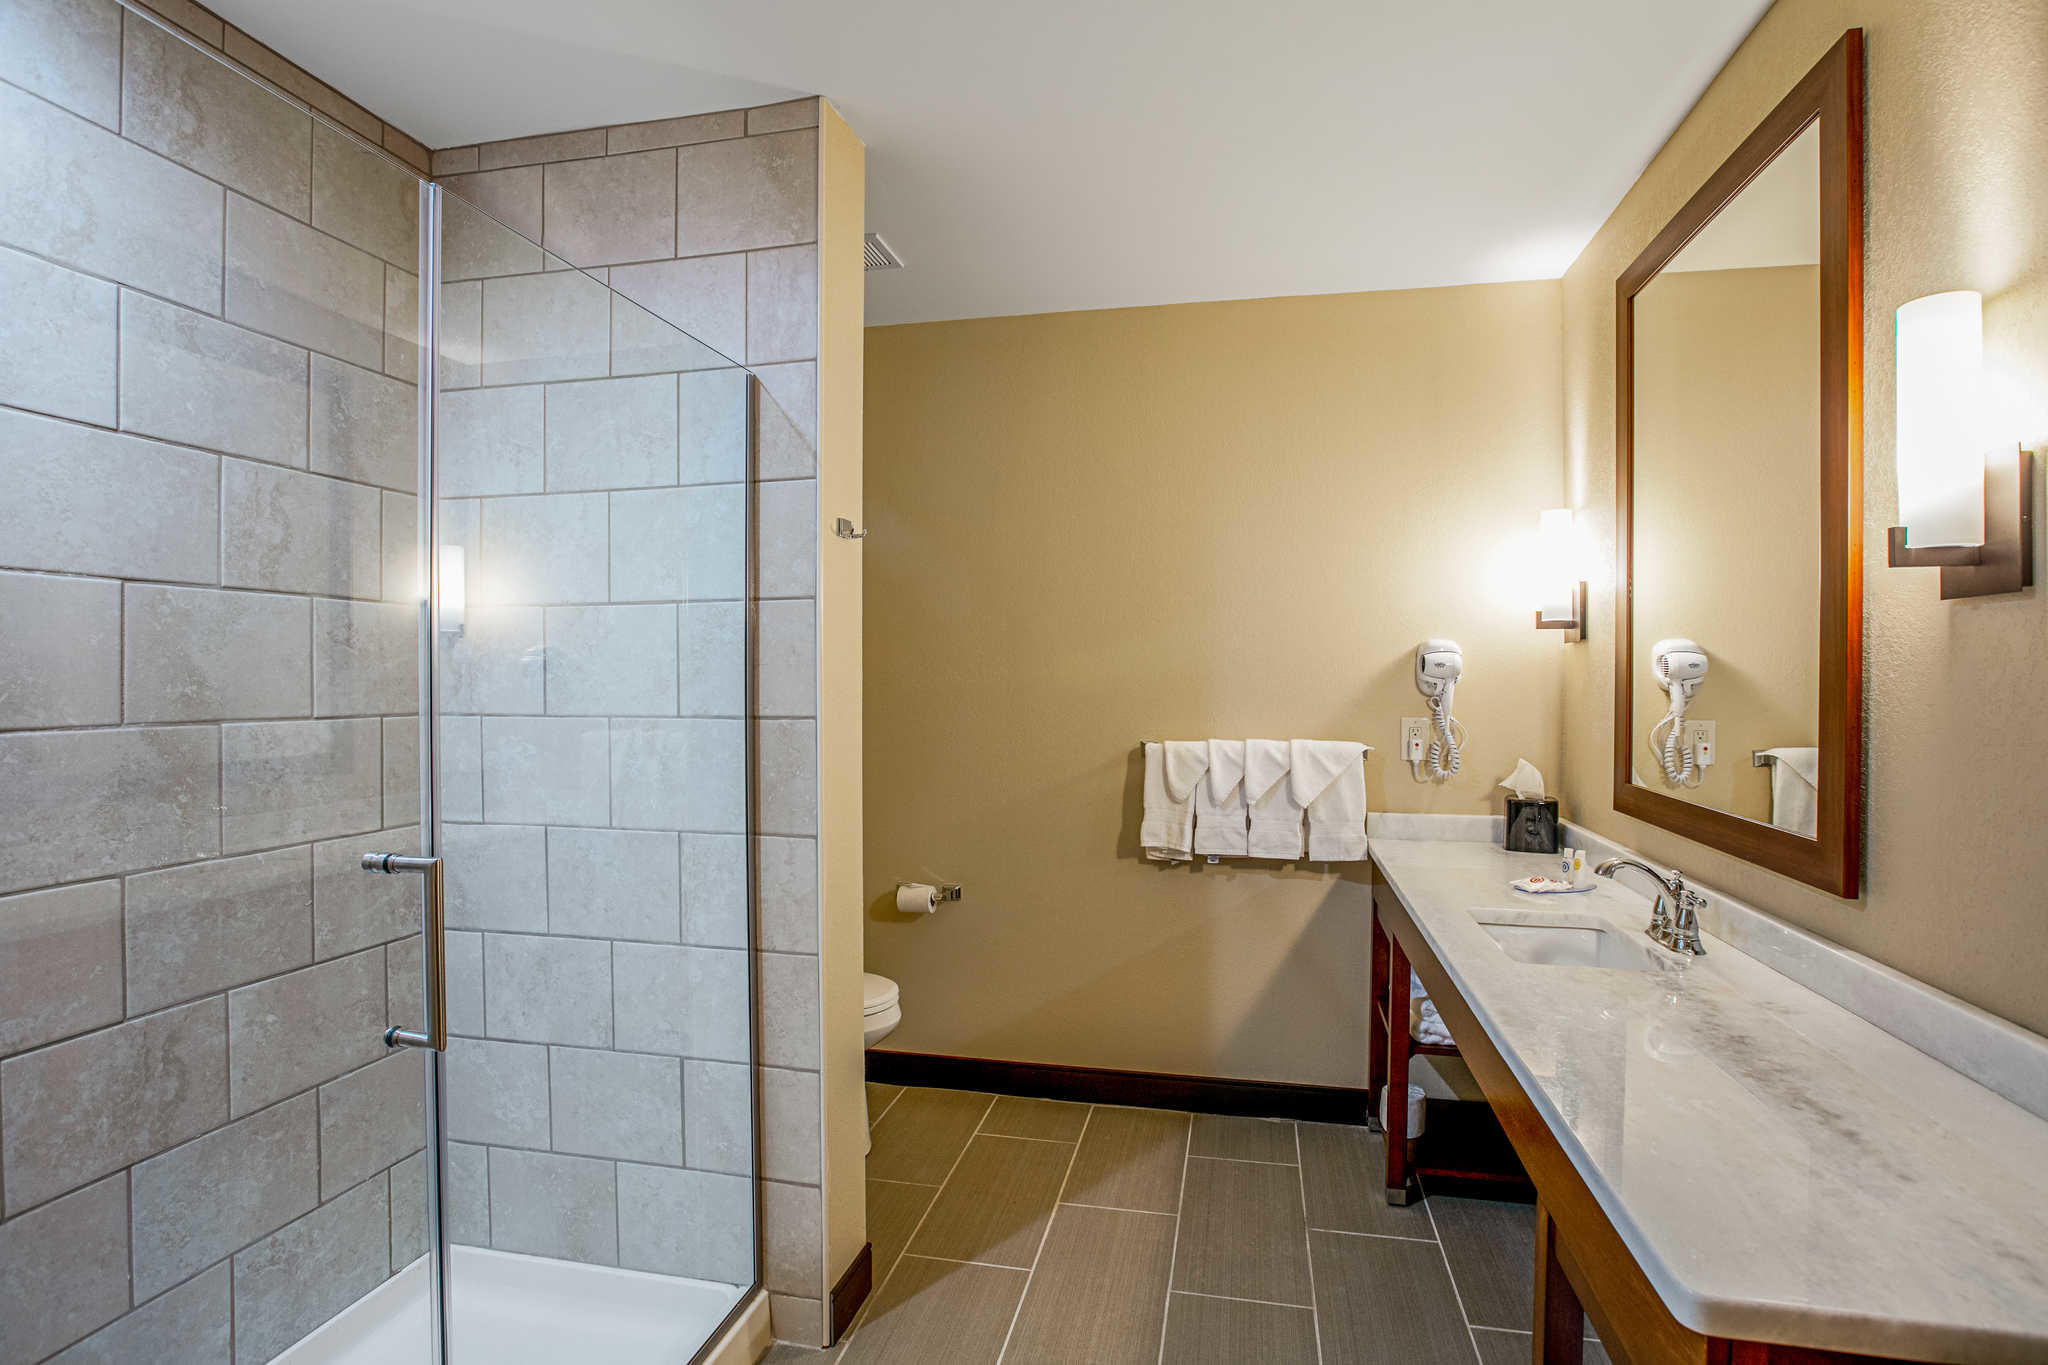 Comfort Suites image 37